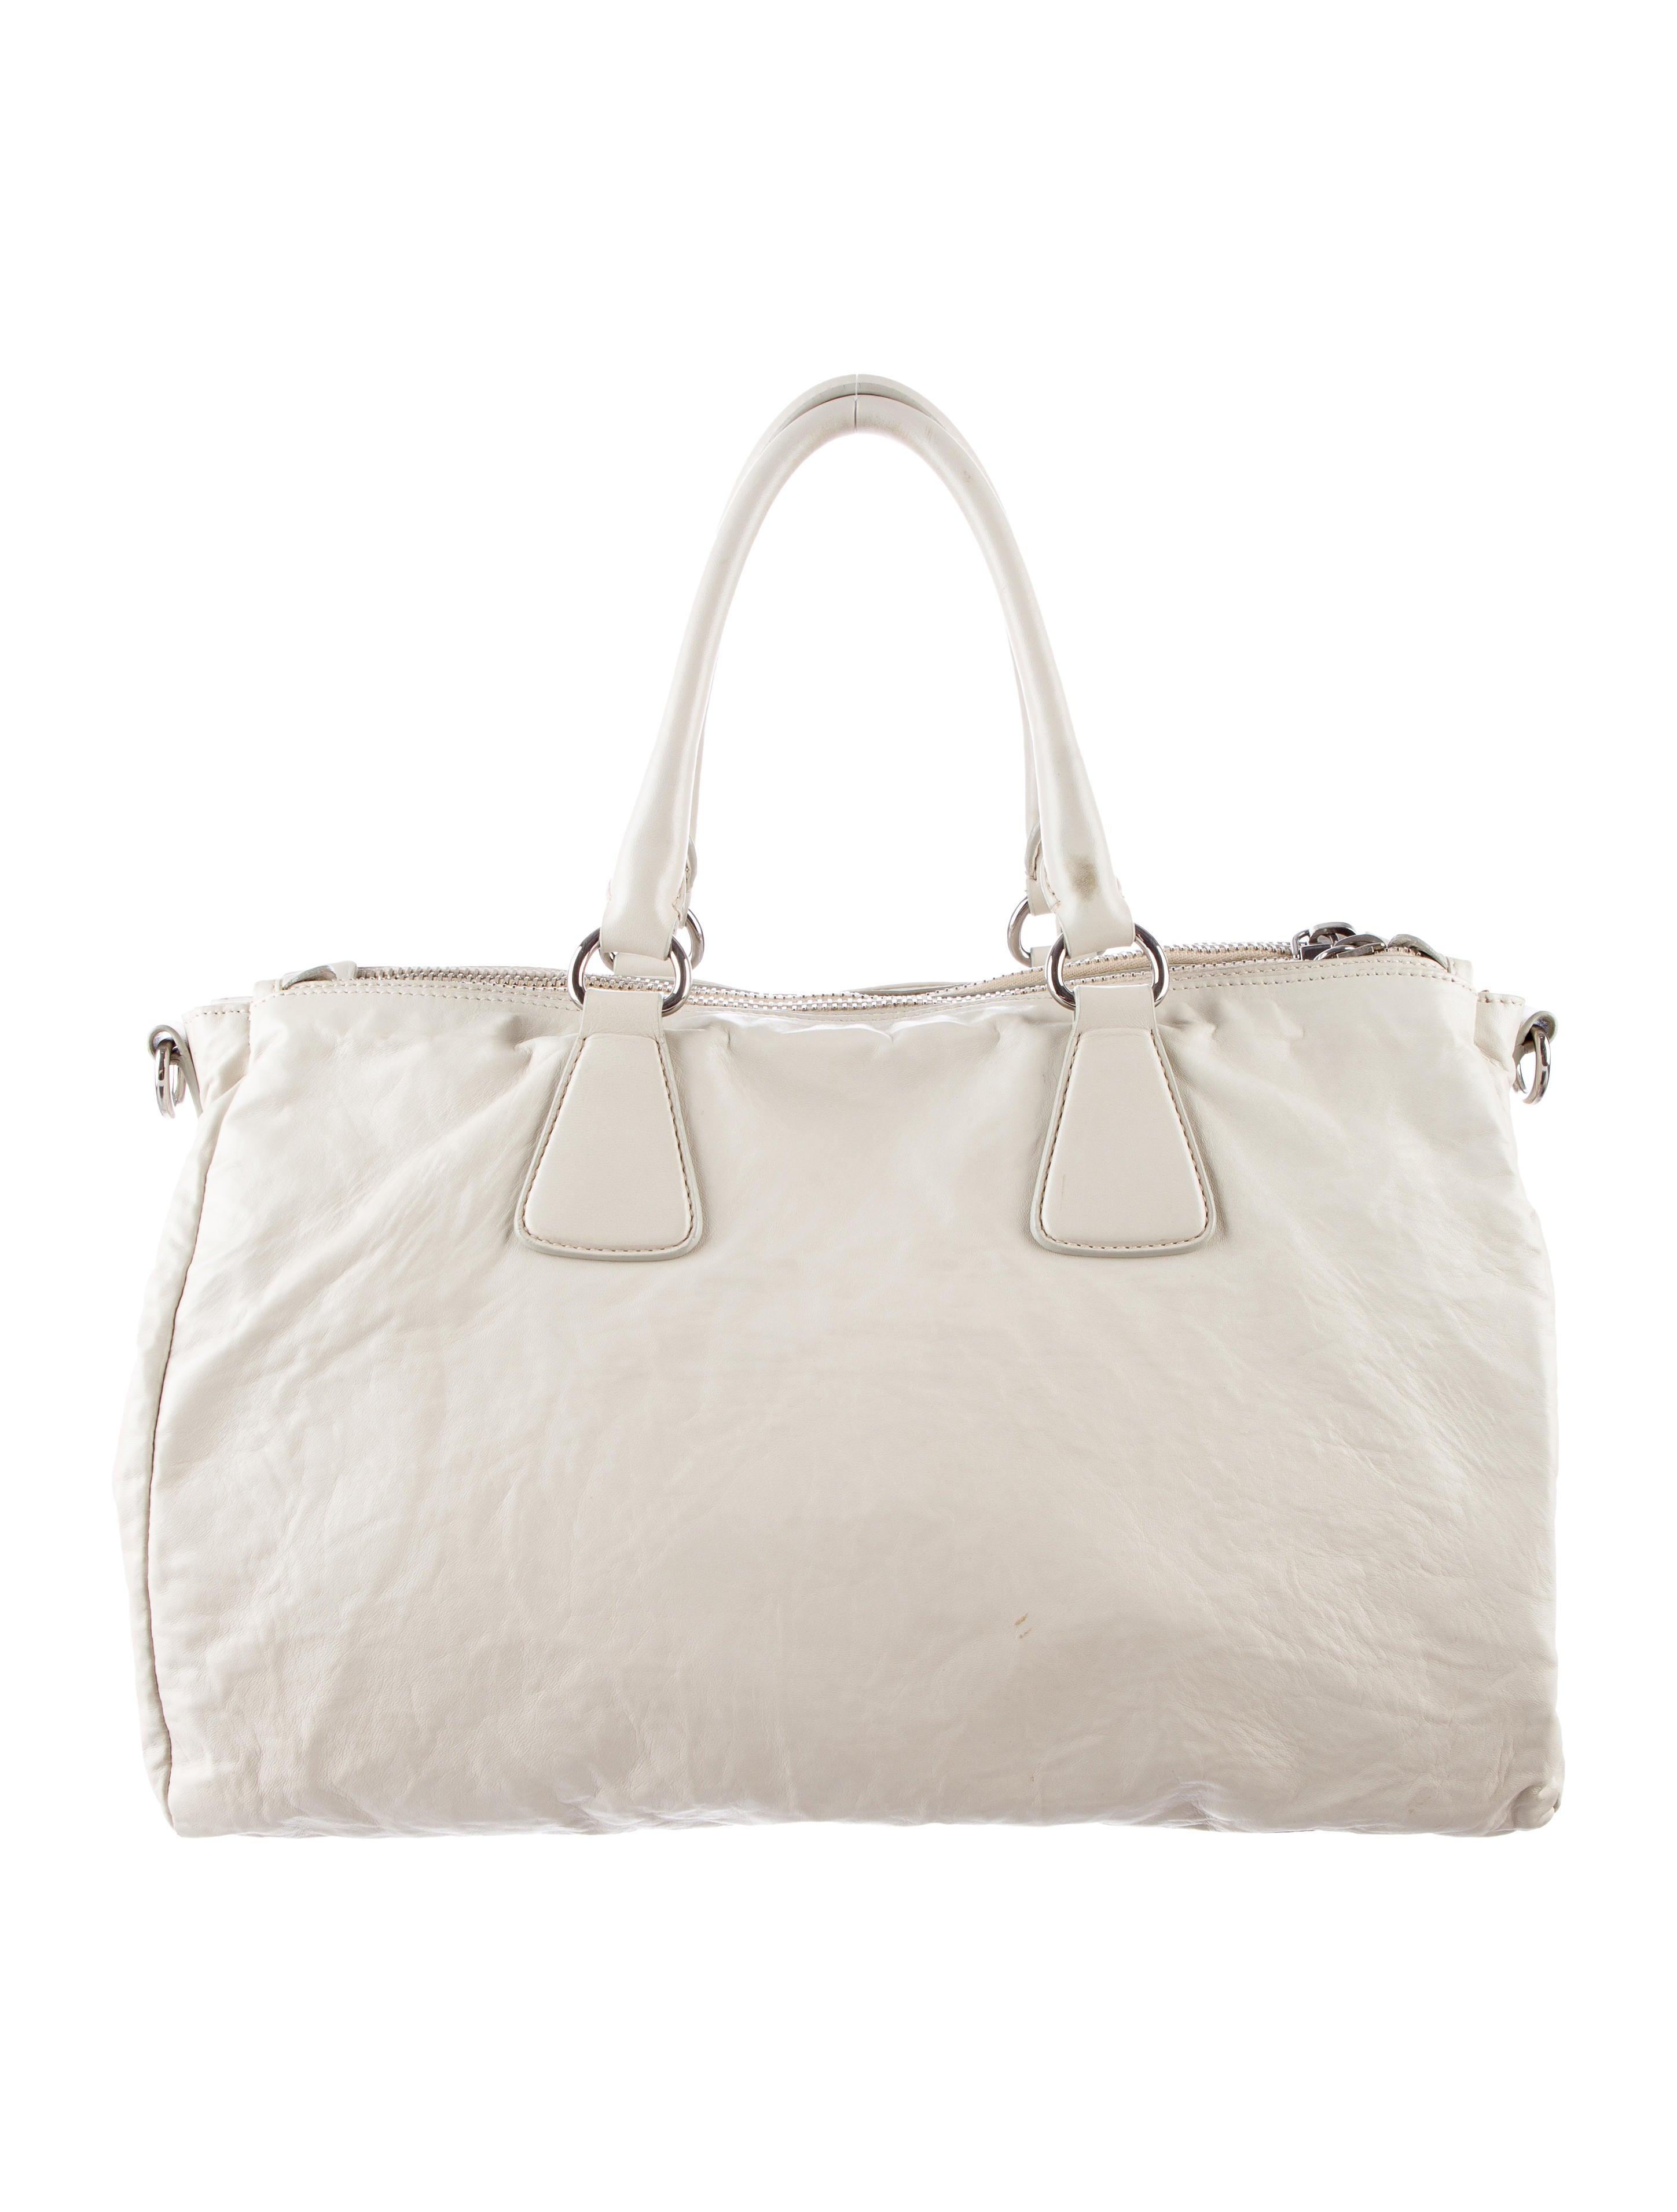 prada handbags cheap prices